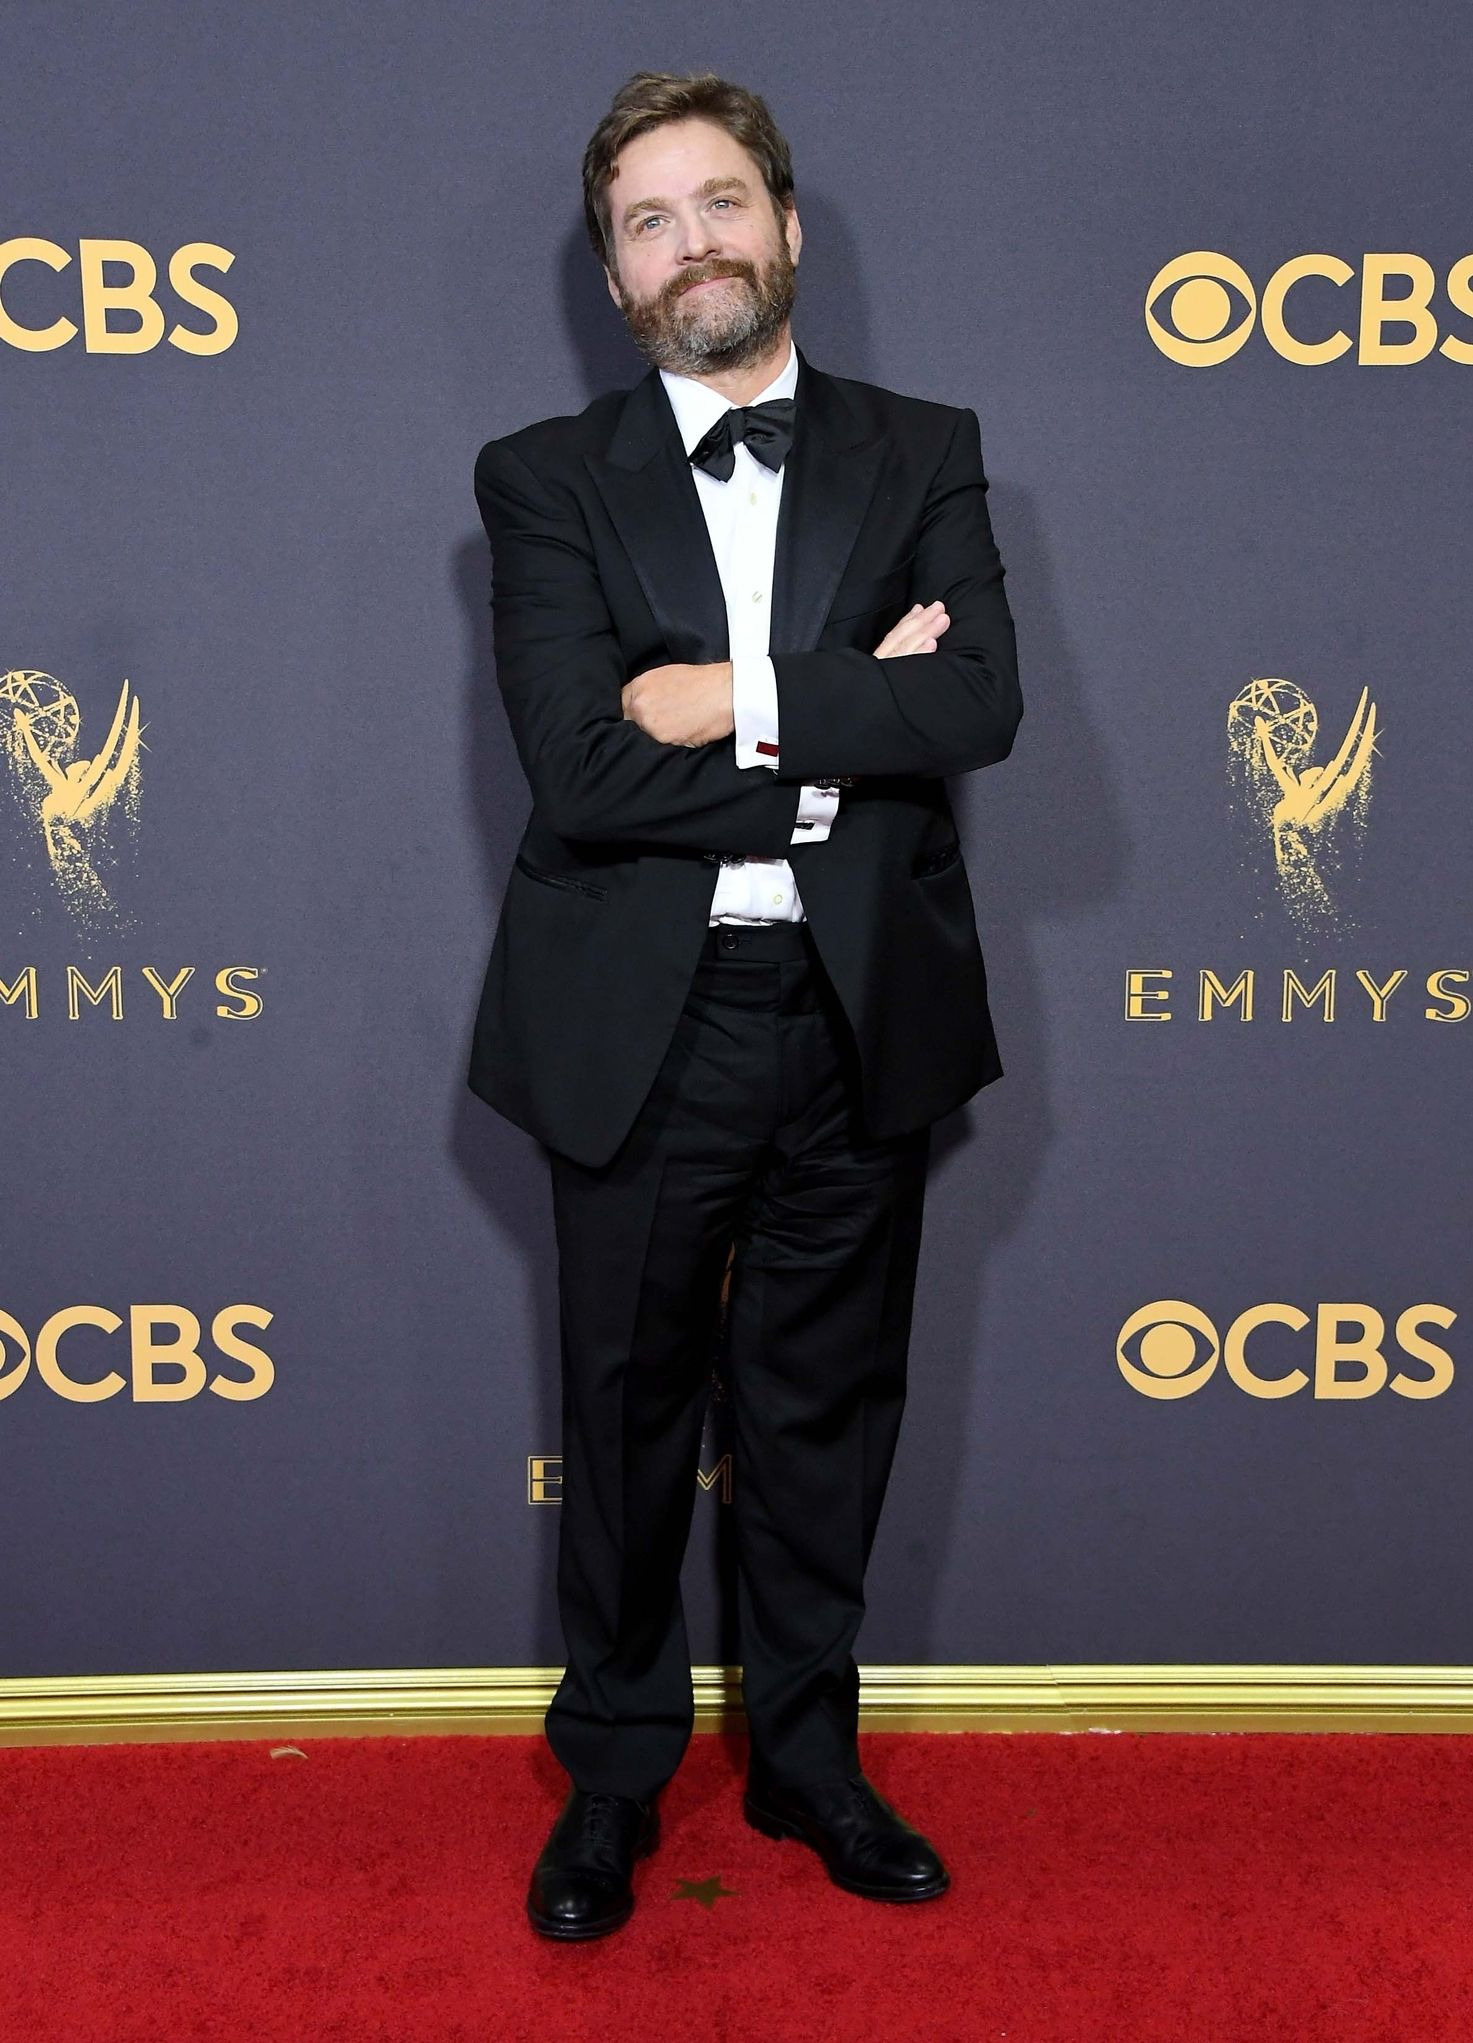 ZACH GALIFIANAKIS at Emmys 2017